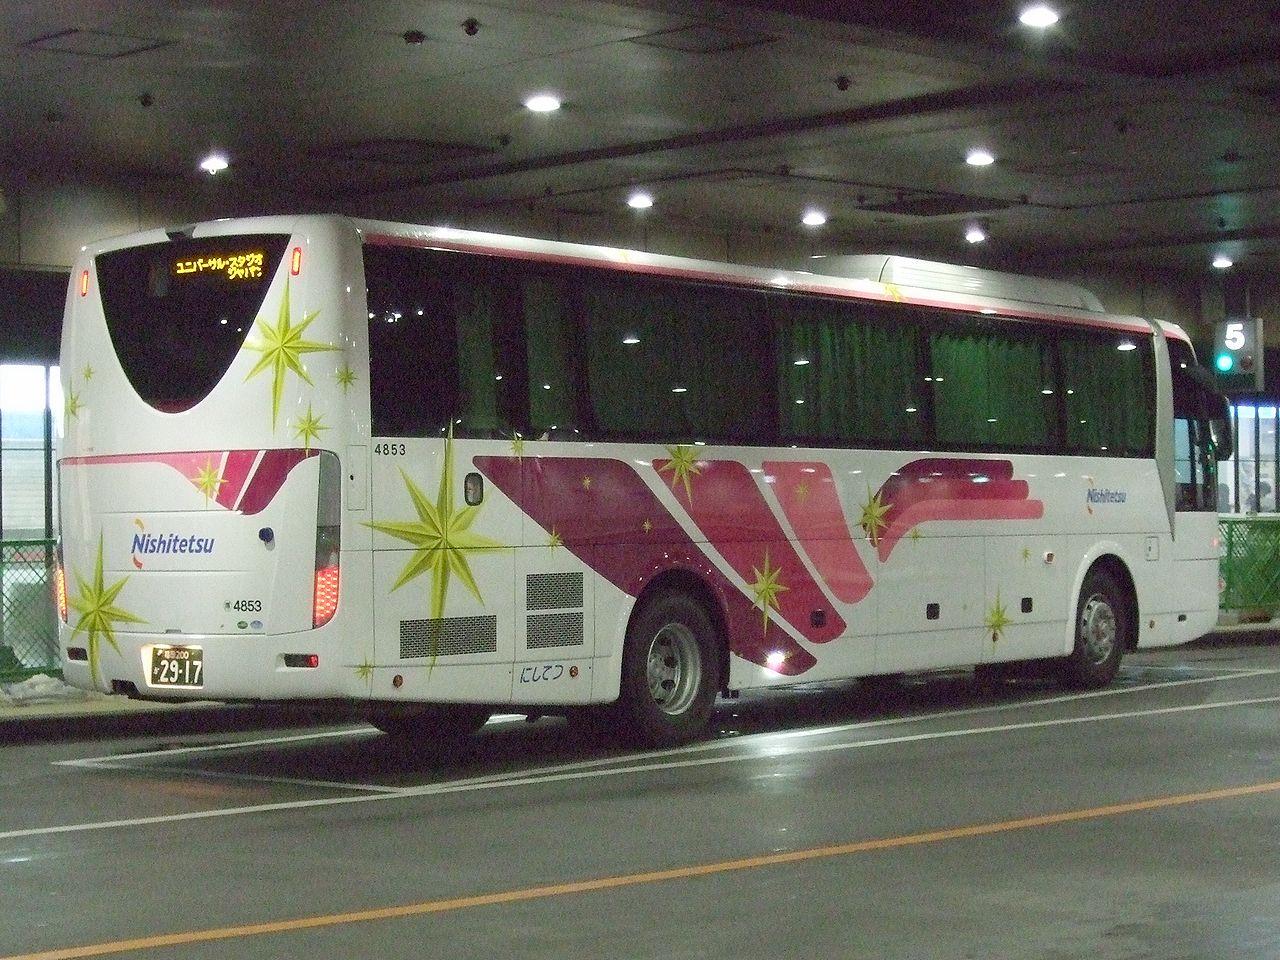 File:Nishitetsu bus 4853.jpg